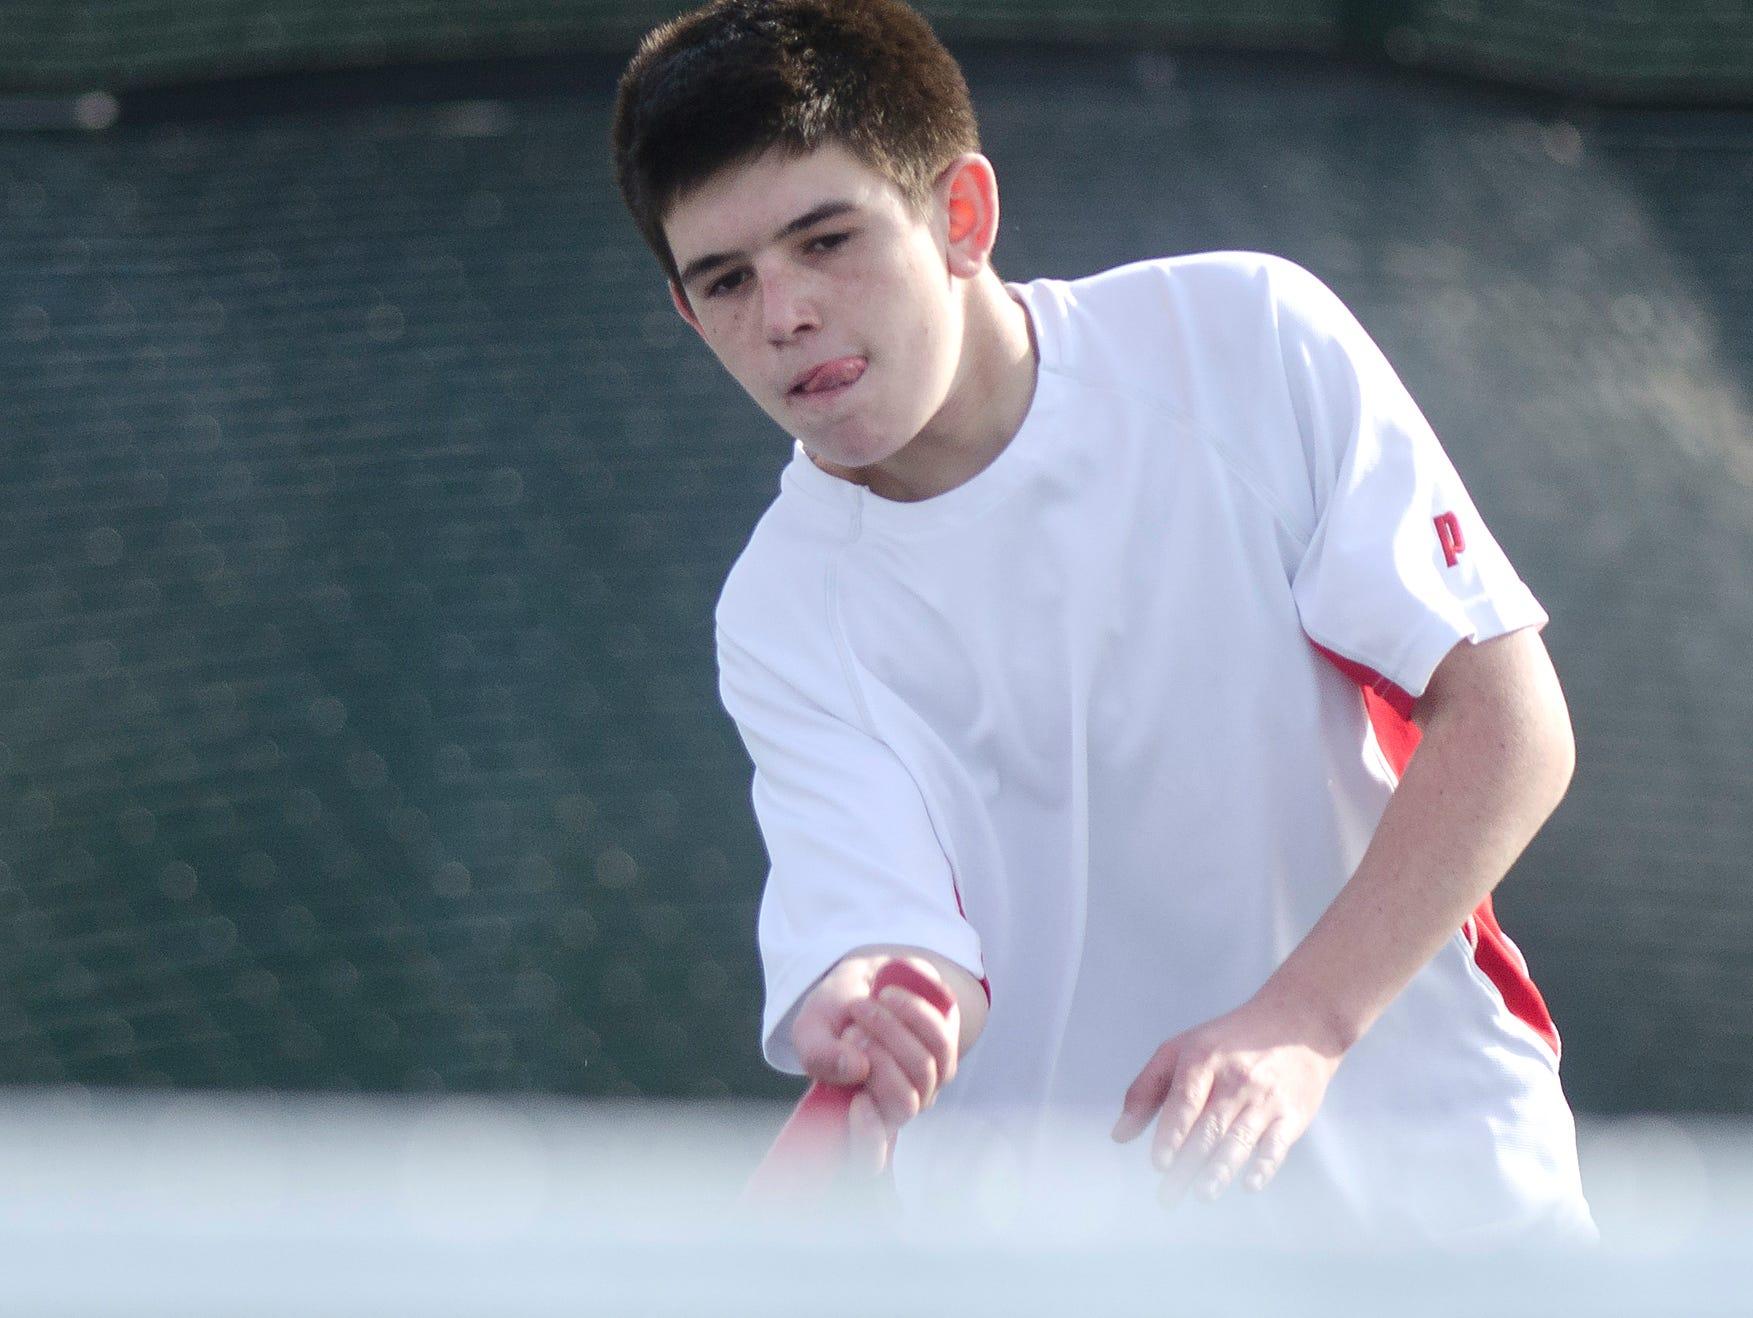 Champlain Valley doubles player David Huber returns a shot during a match last season.